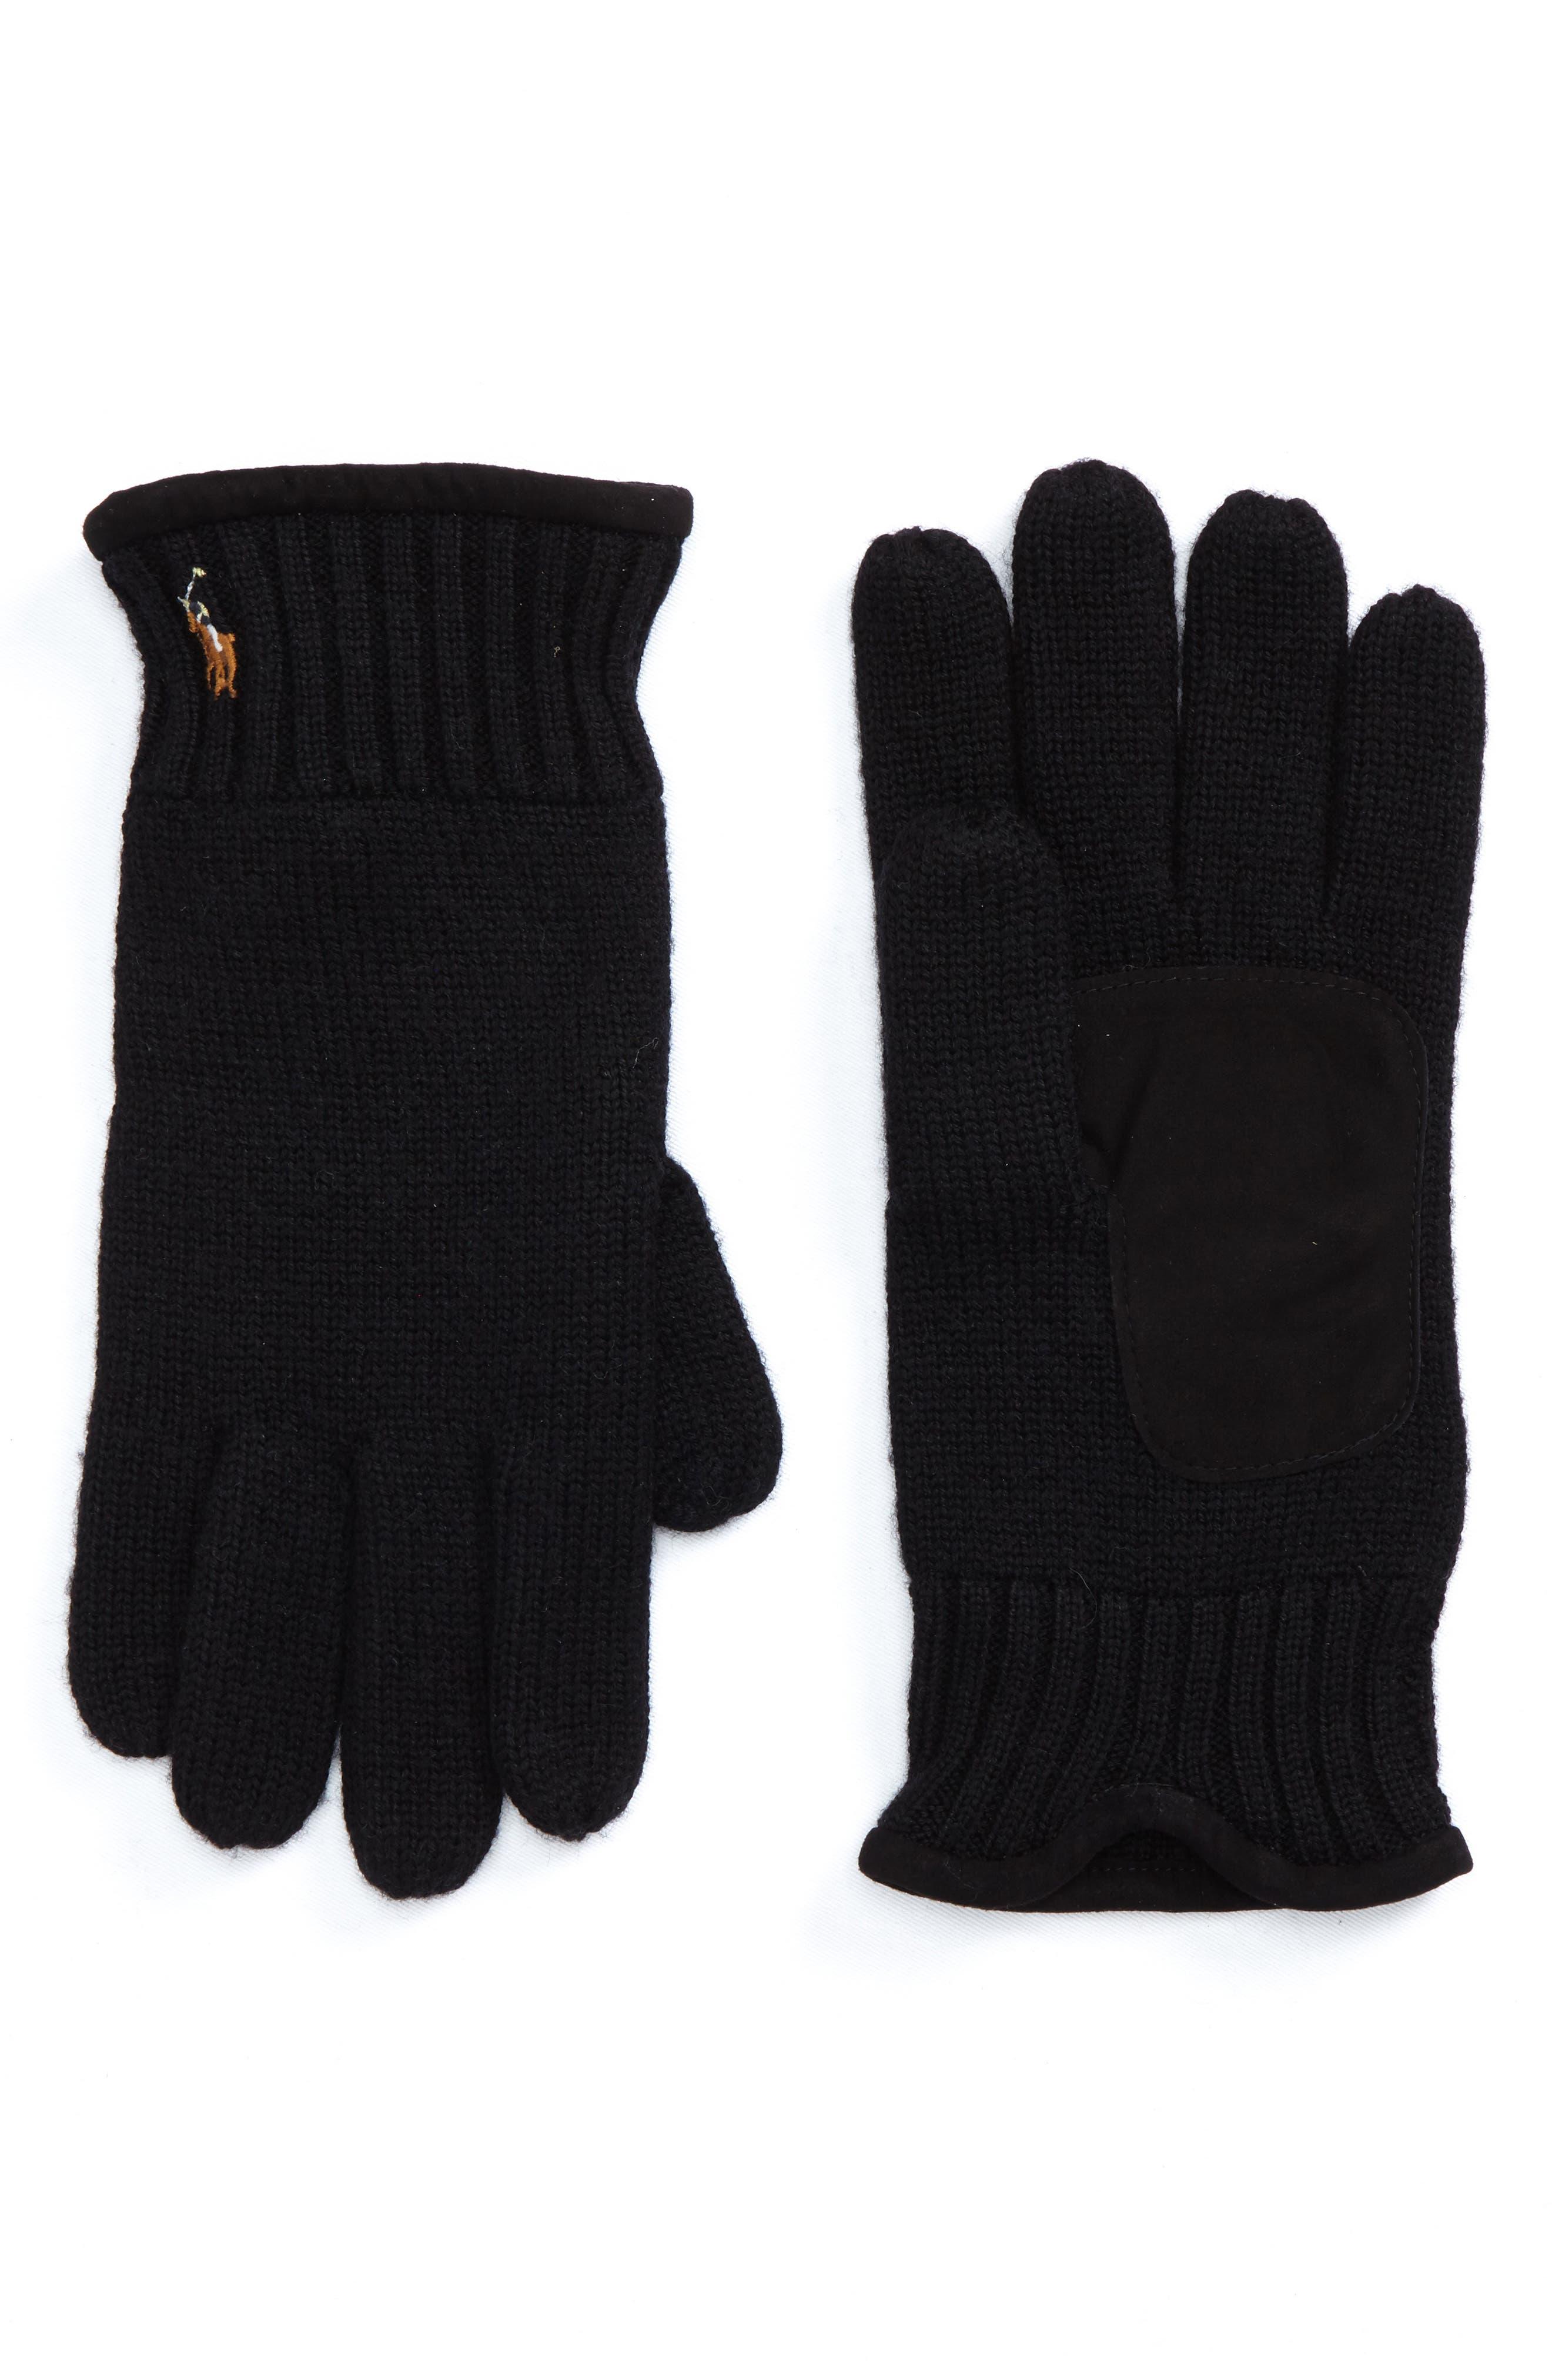 Main Image - Polo Ralph Lauren Classic Luxe Merino Wool Gloves